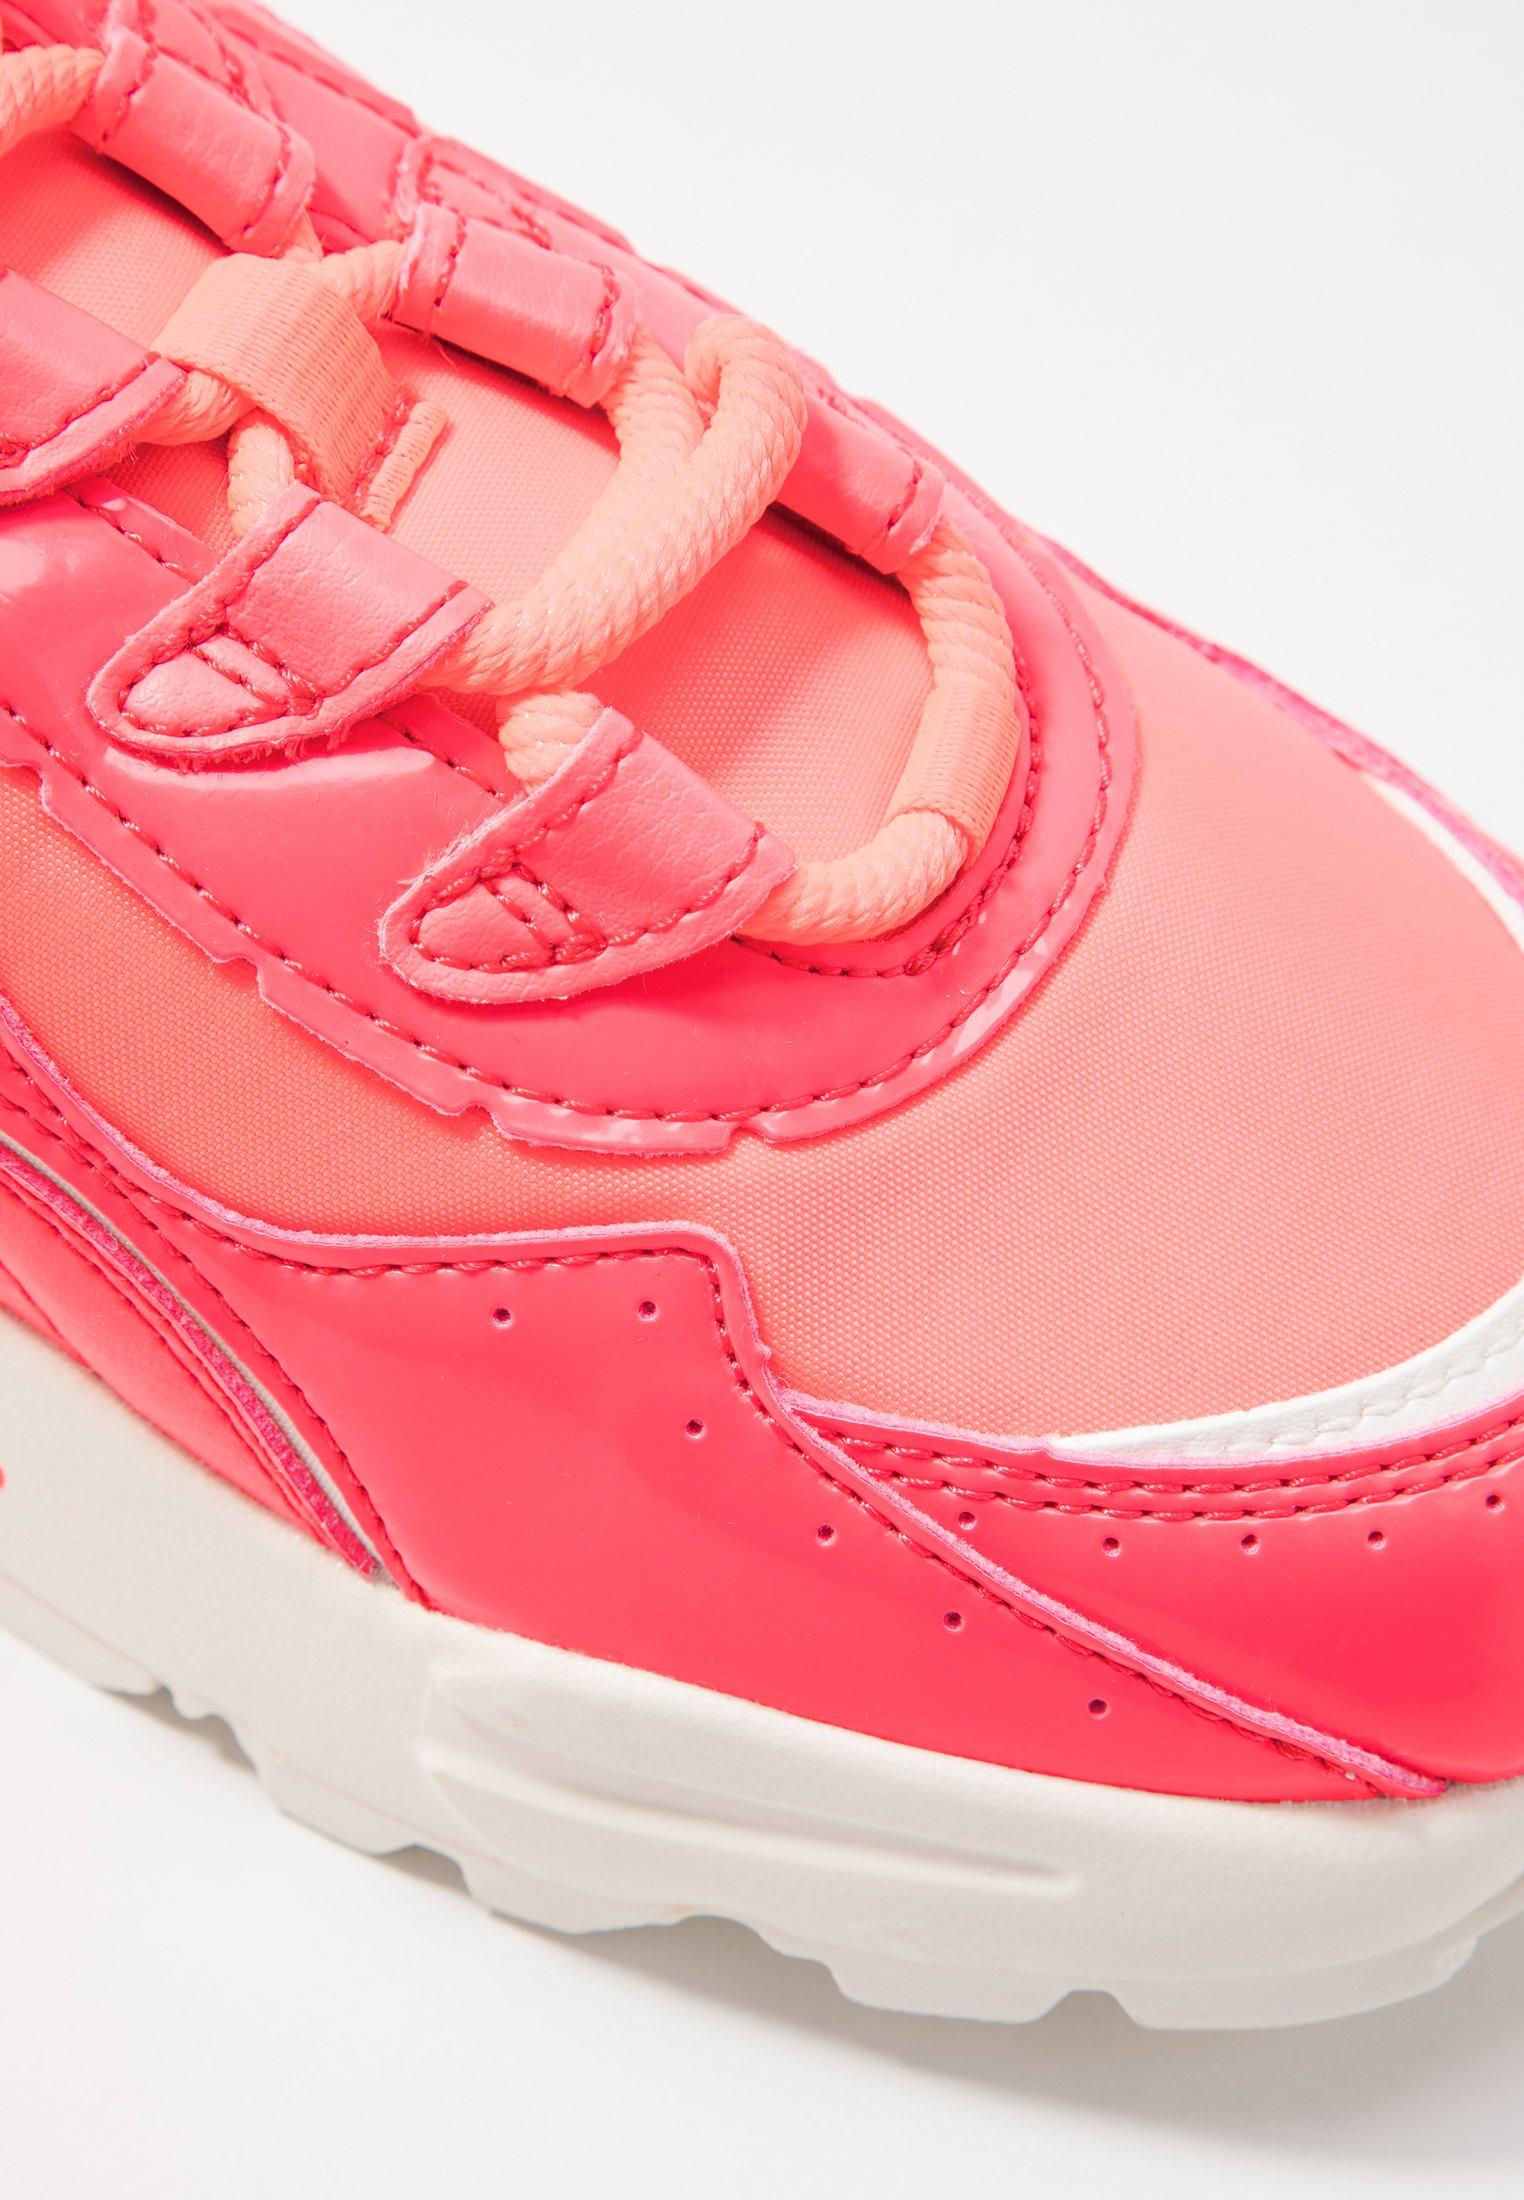 Puma CELL STELLAR NEON Sneaker low pink alertheather